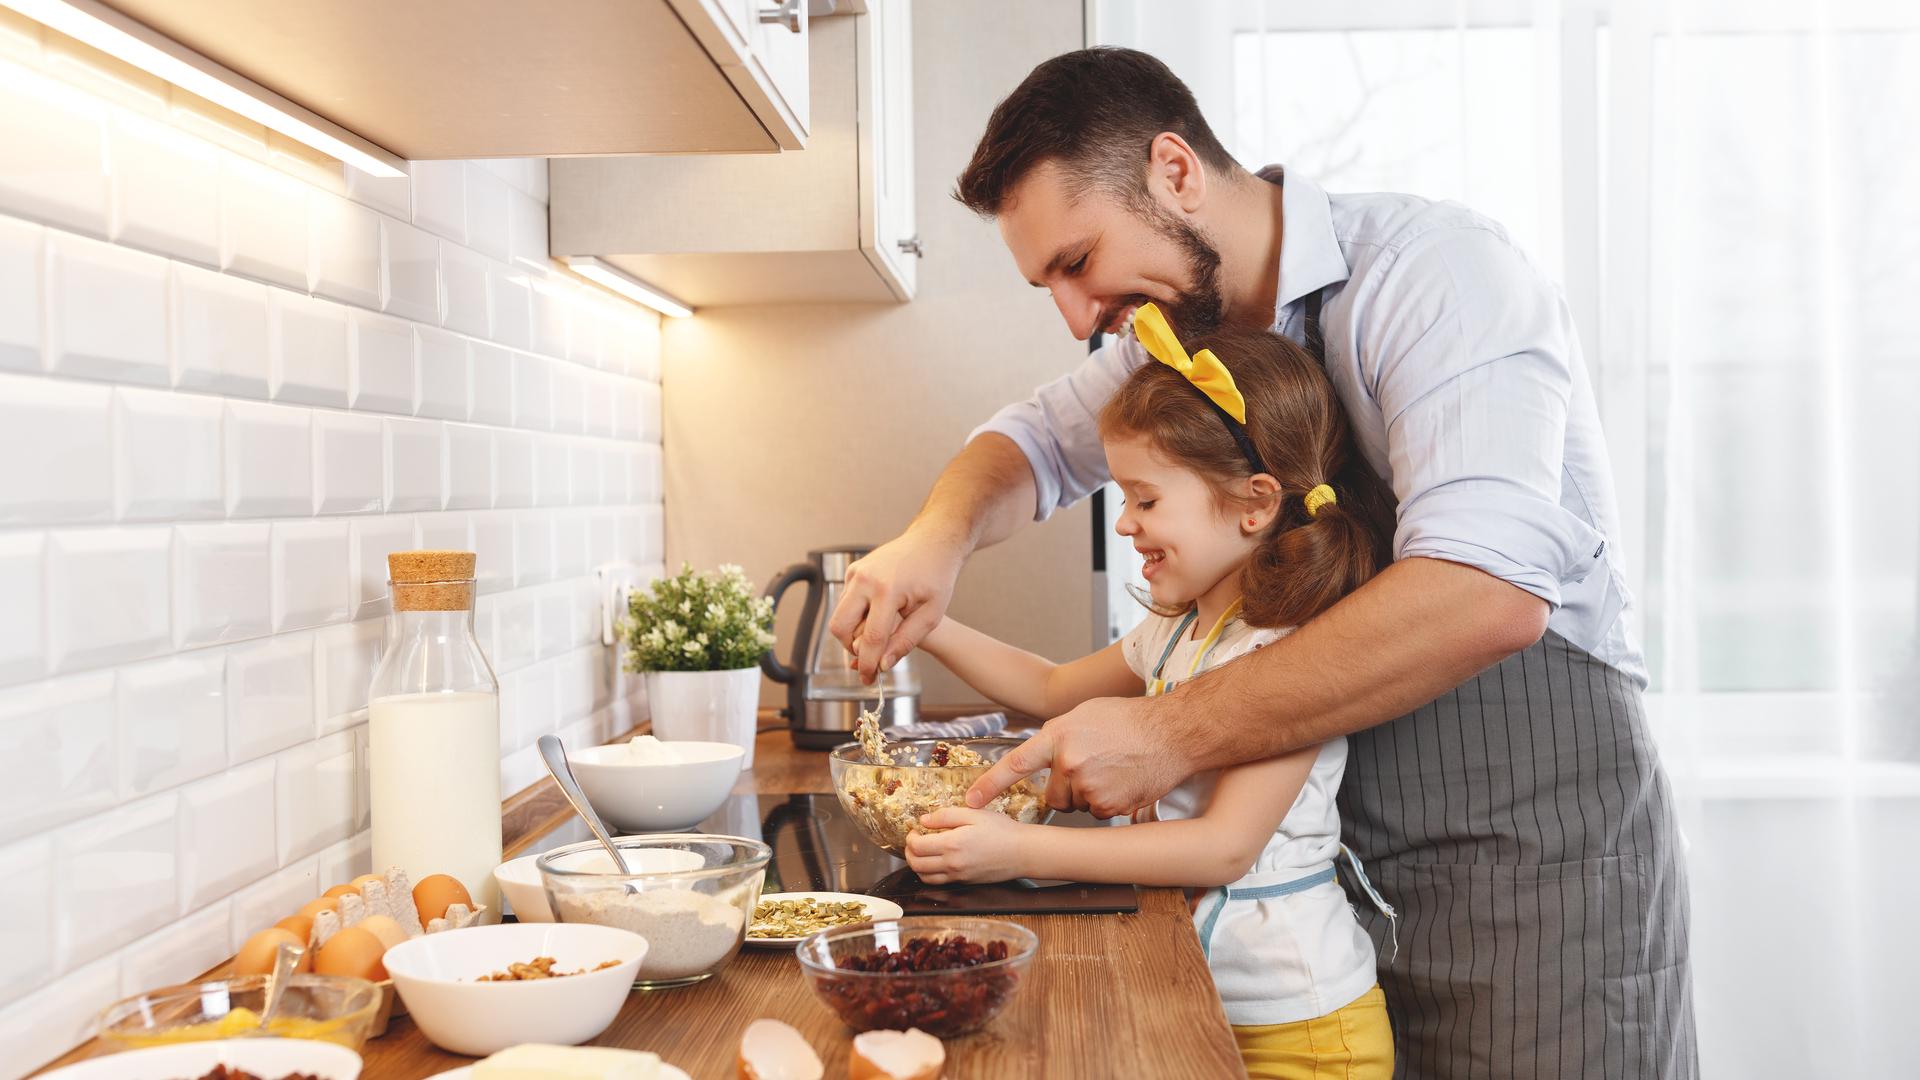 papa e hija cocinando